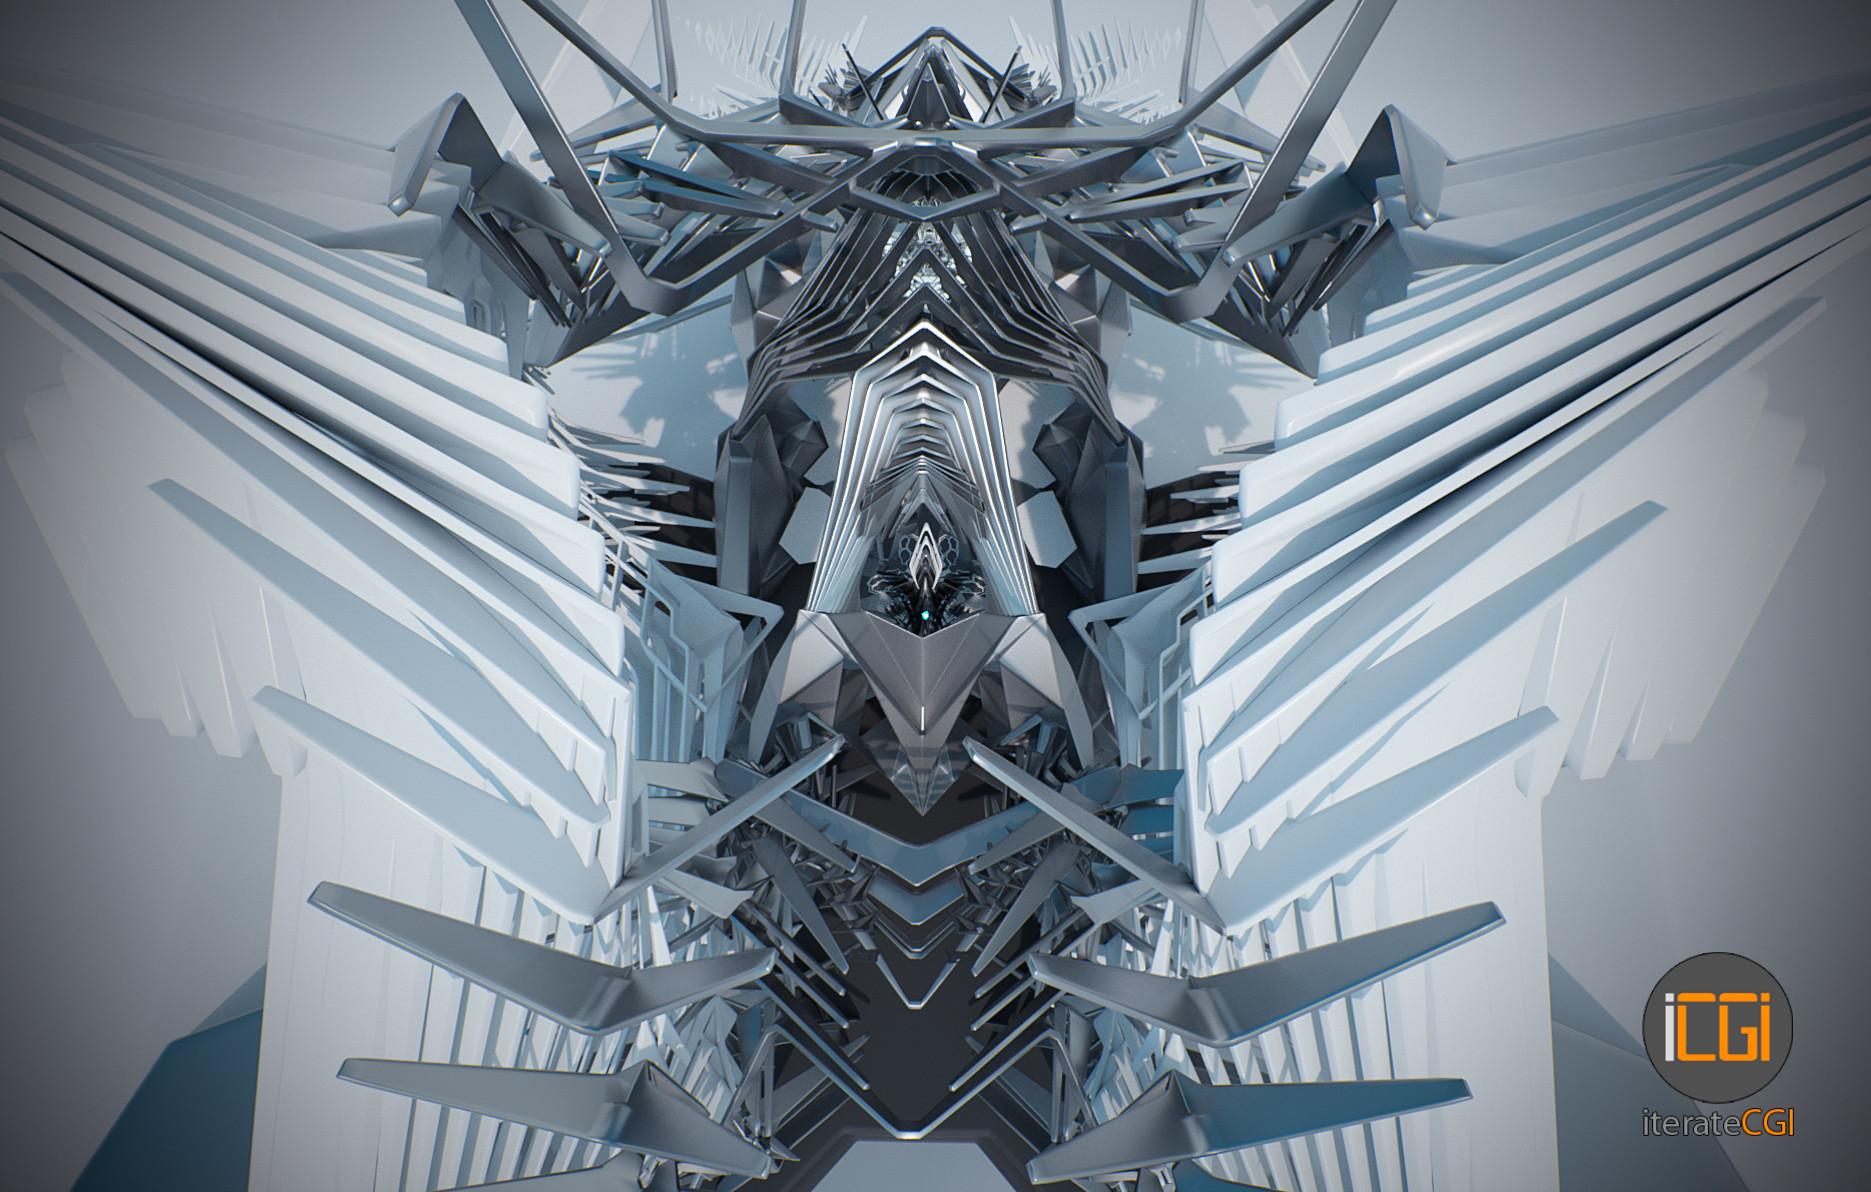 Johan de leenheer generative 3d symmetries 1